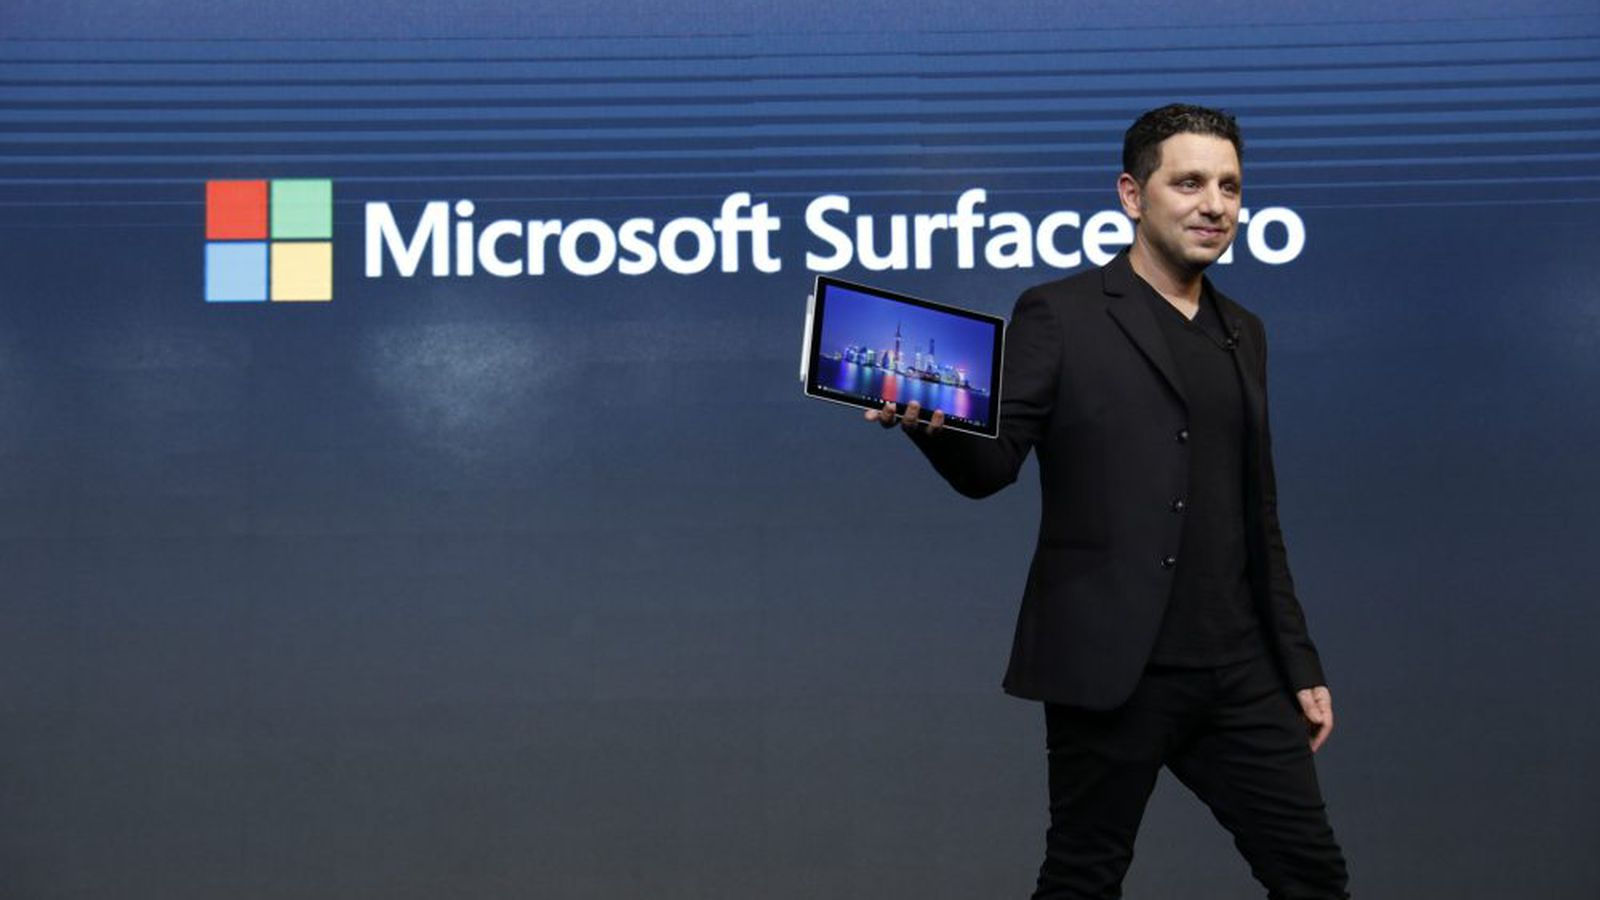 Watch Panos Panay launch Microsoft's new Surface Pro